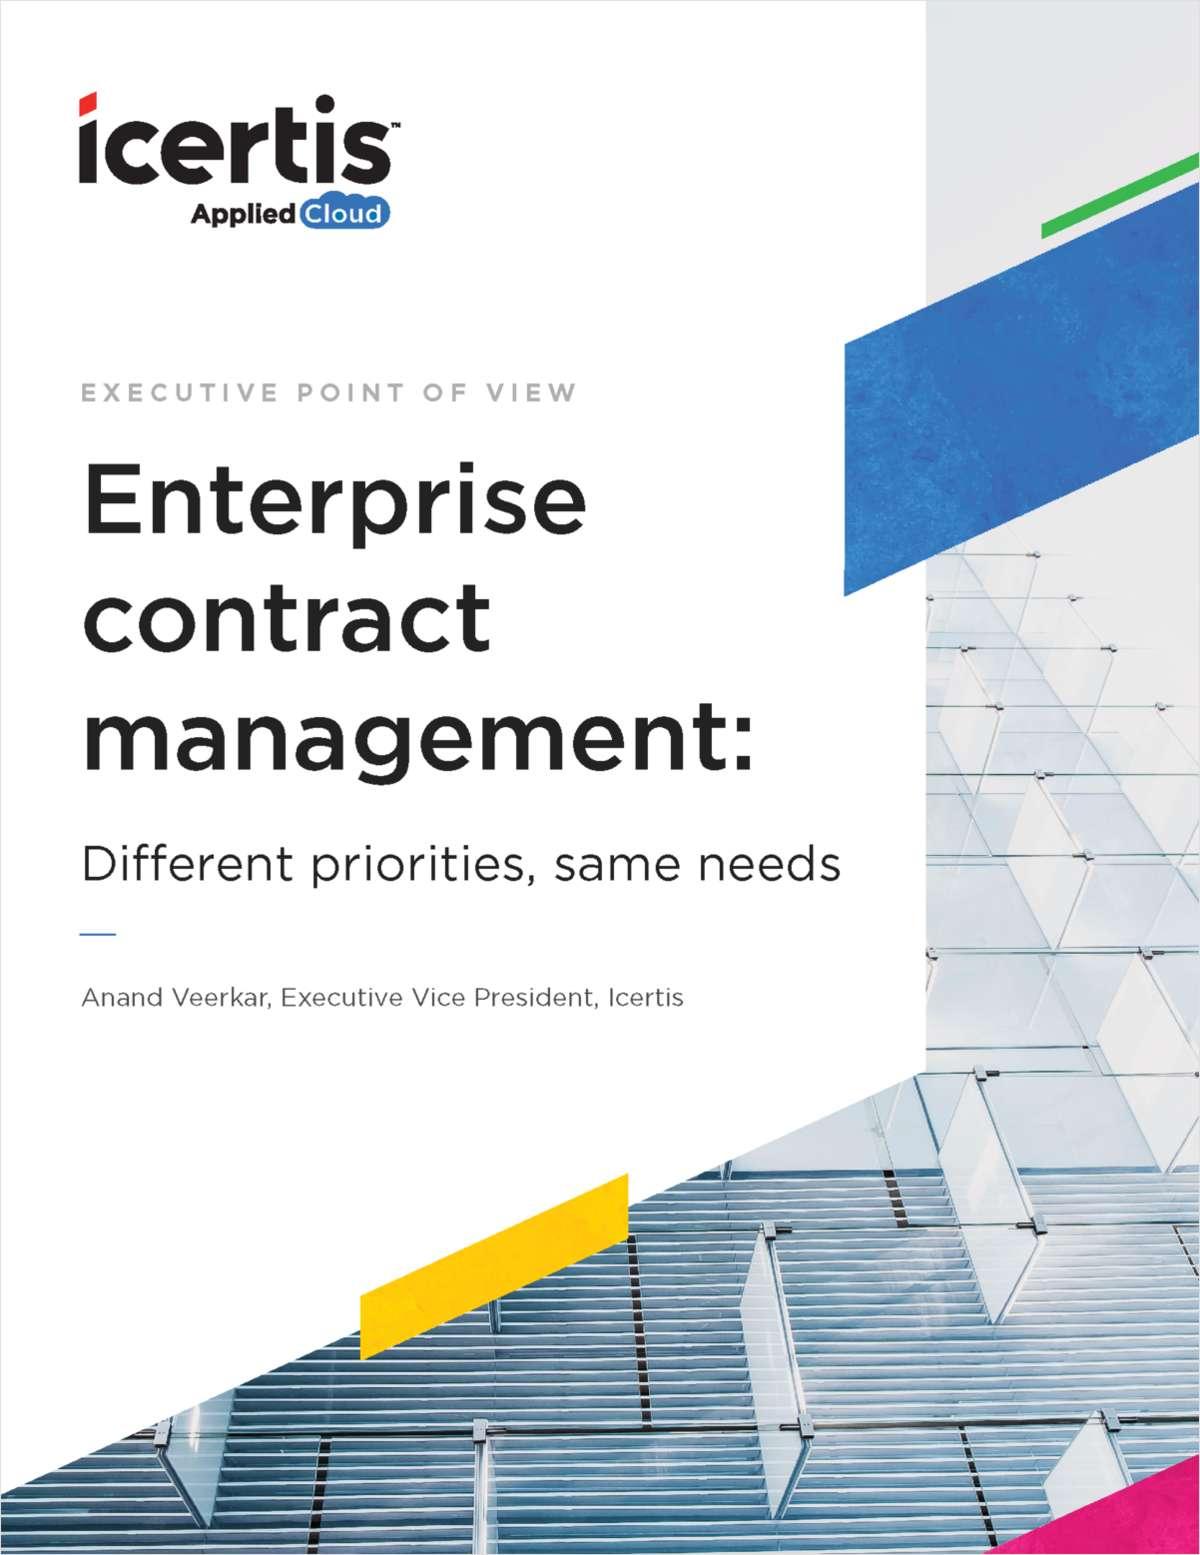 Enterprise Contract Management: Different priorities, same needs